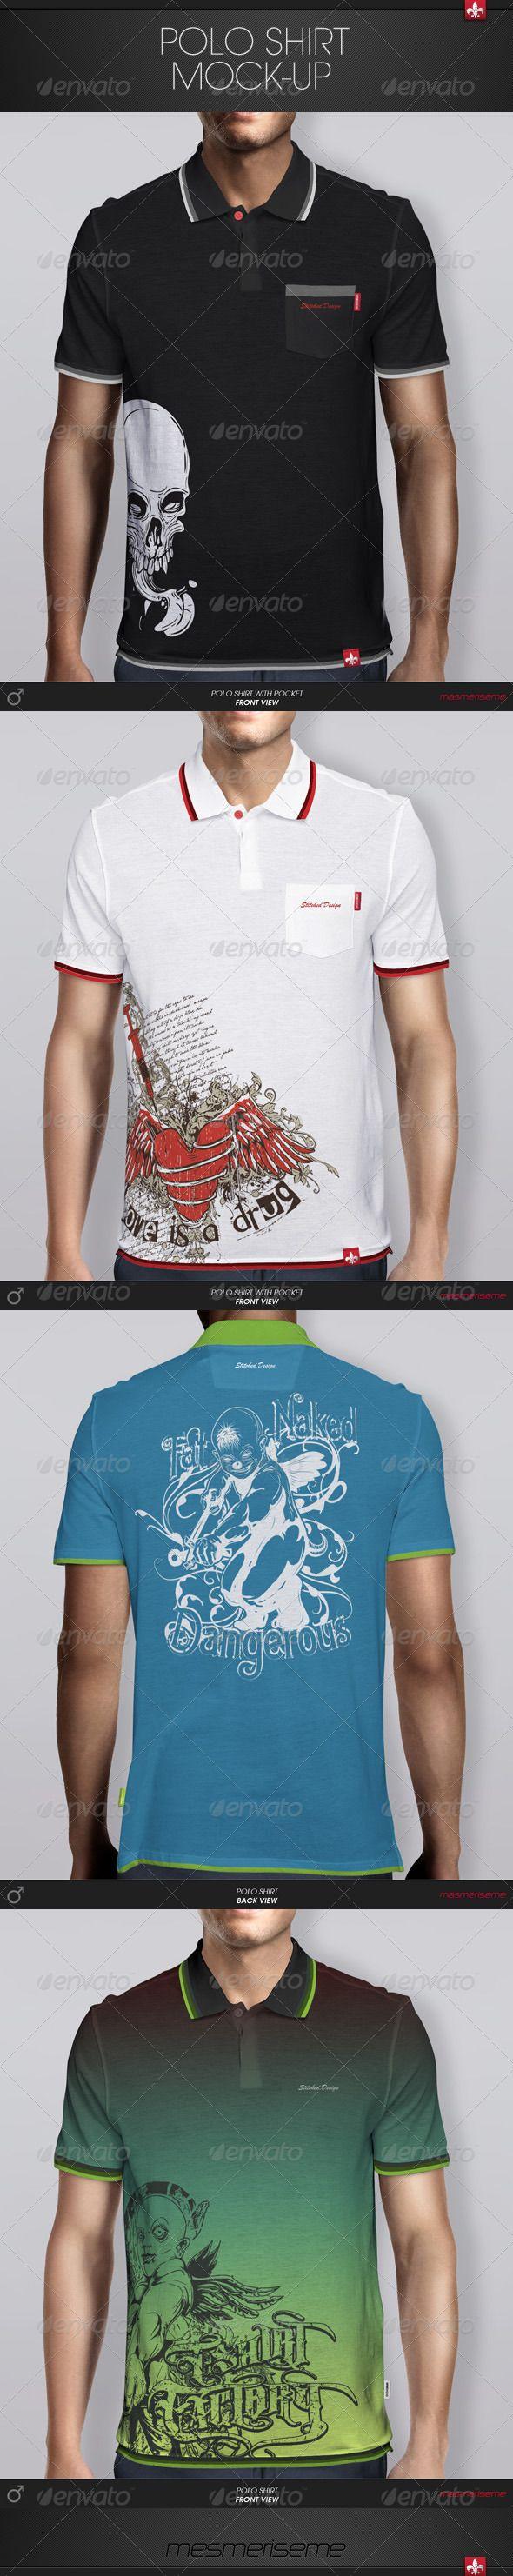 Download 42 Best T Shirt Mockup Templates Free Psd Download Shirt Mockup Clothing Mockup Hoodie Mockup